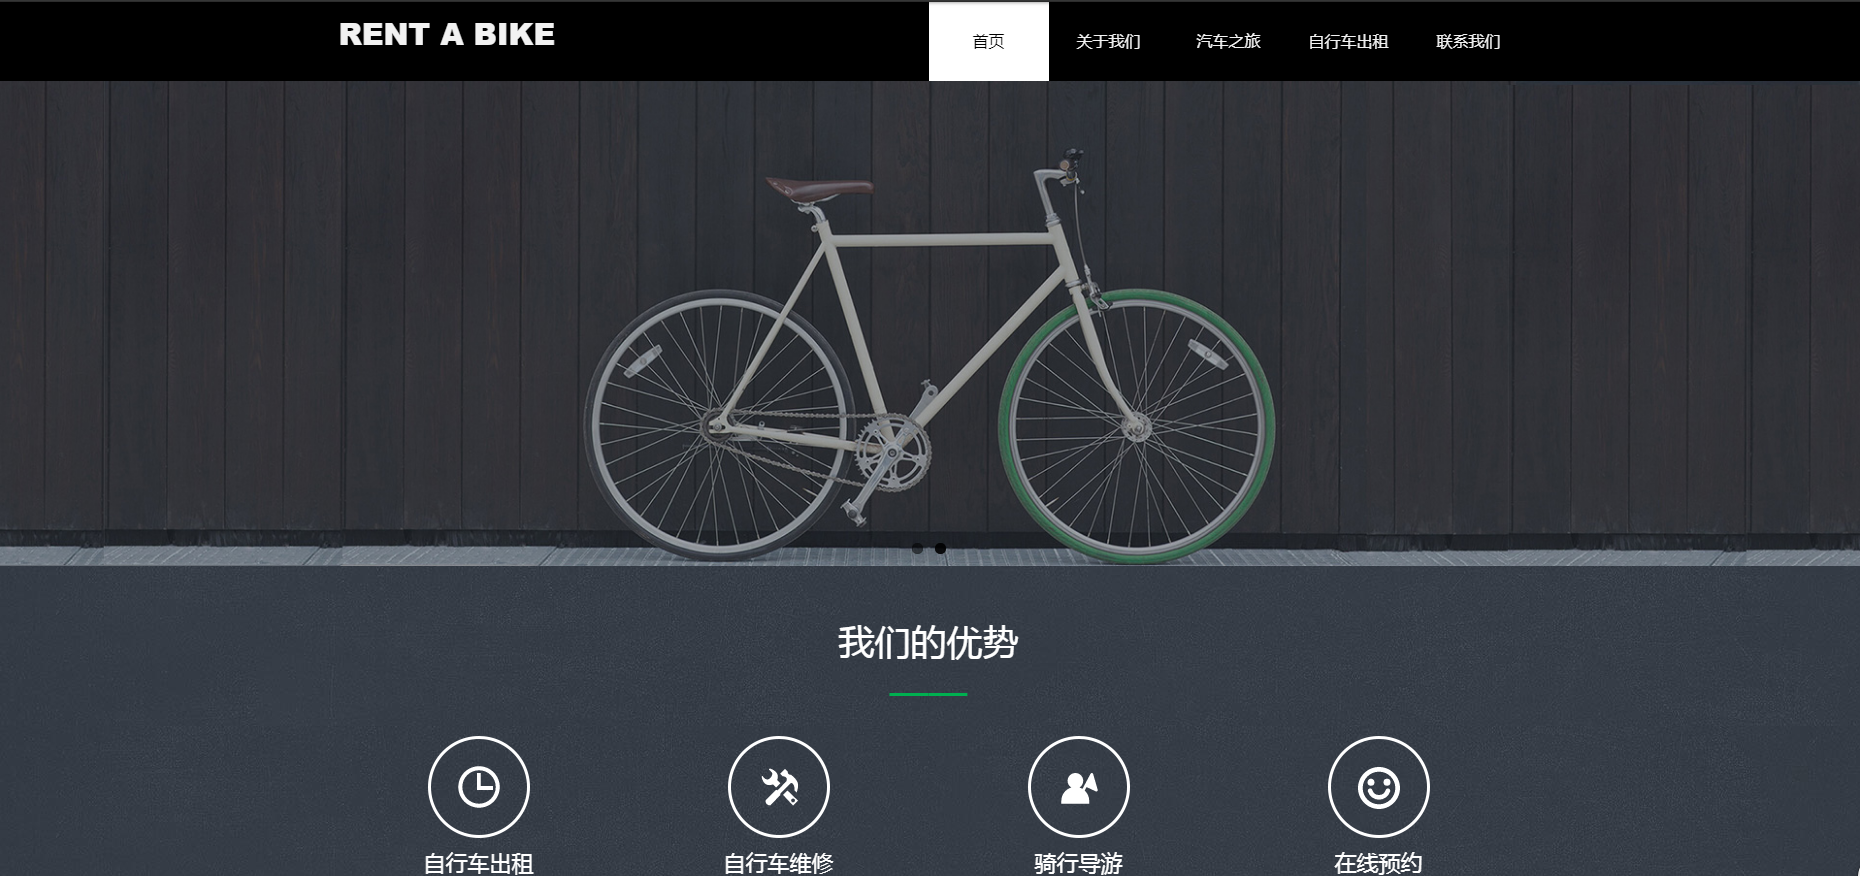 自行车出租 R207